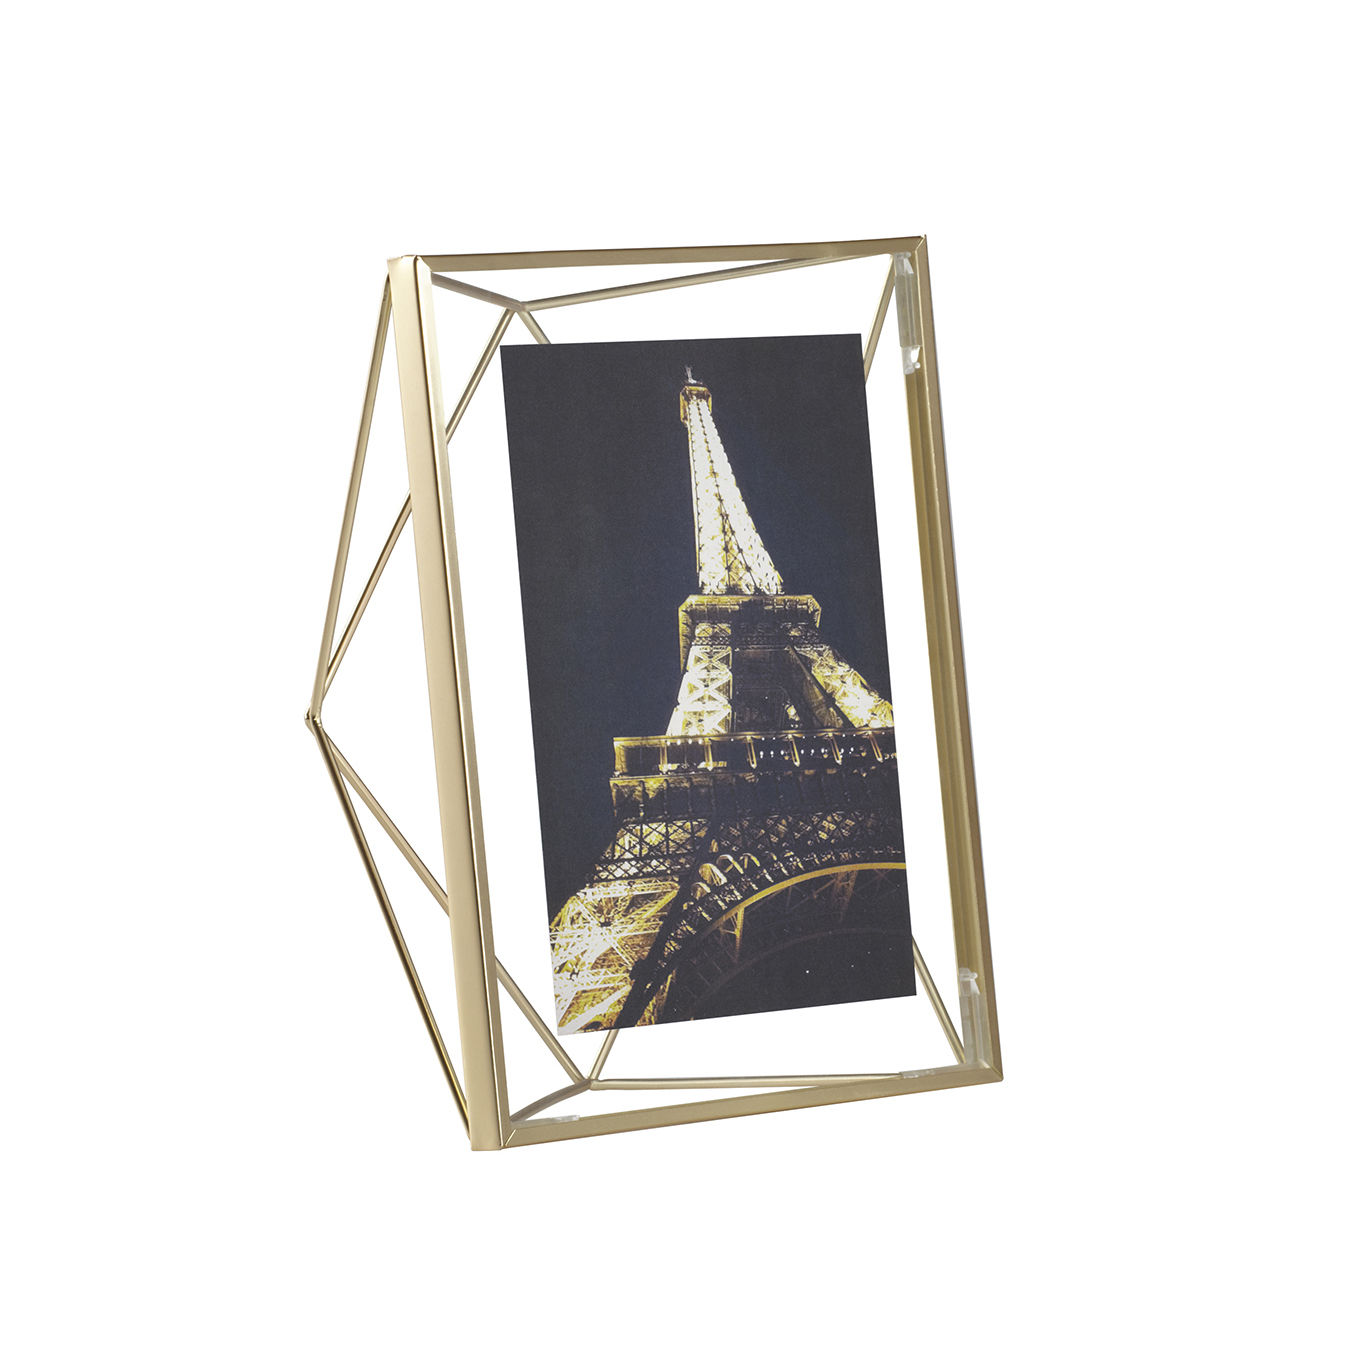 Prisma fotolijst Umbra 18x23cm mat messing